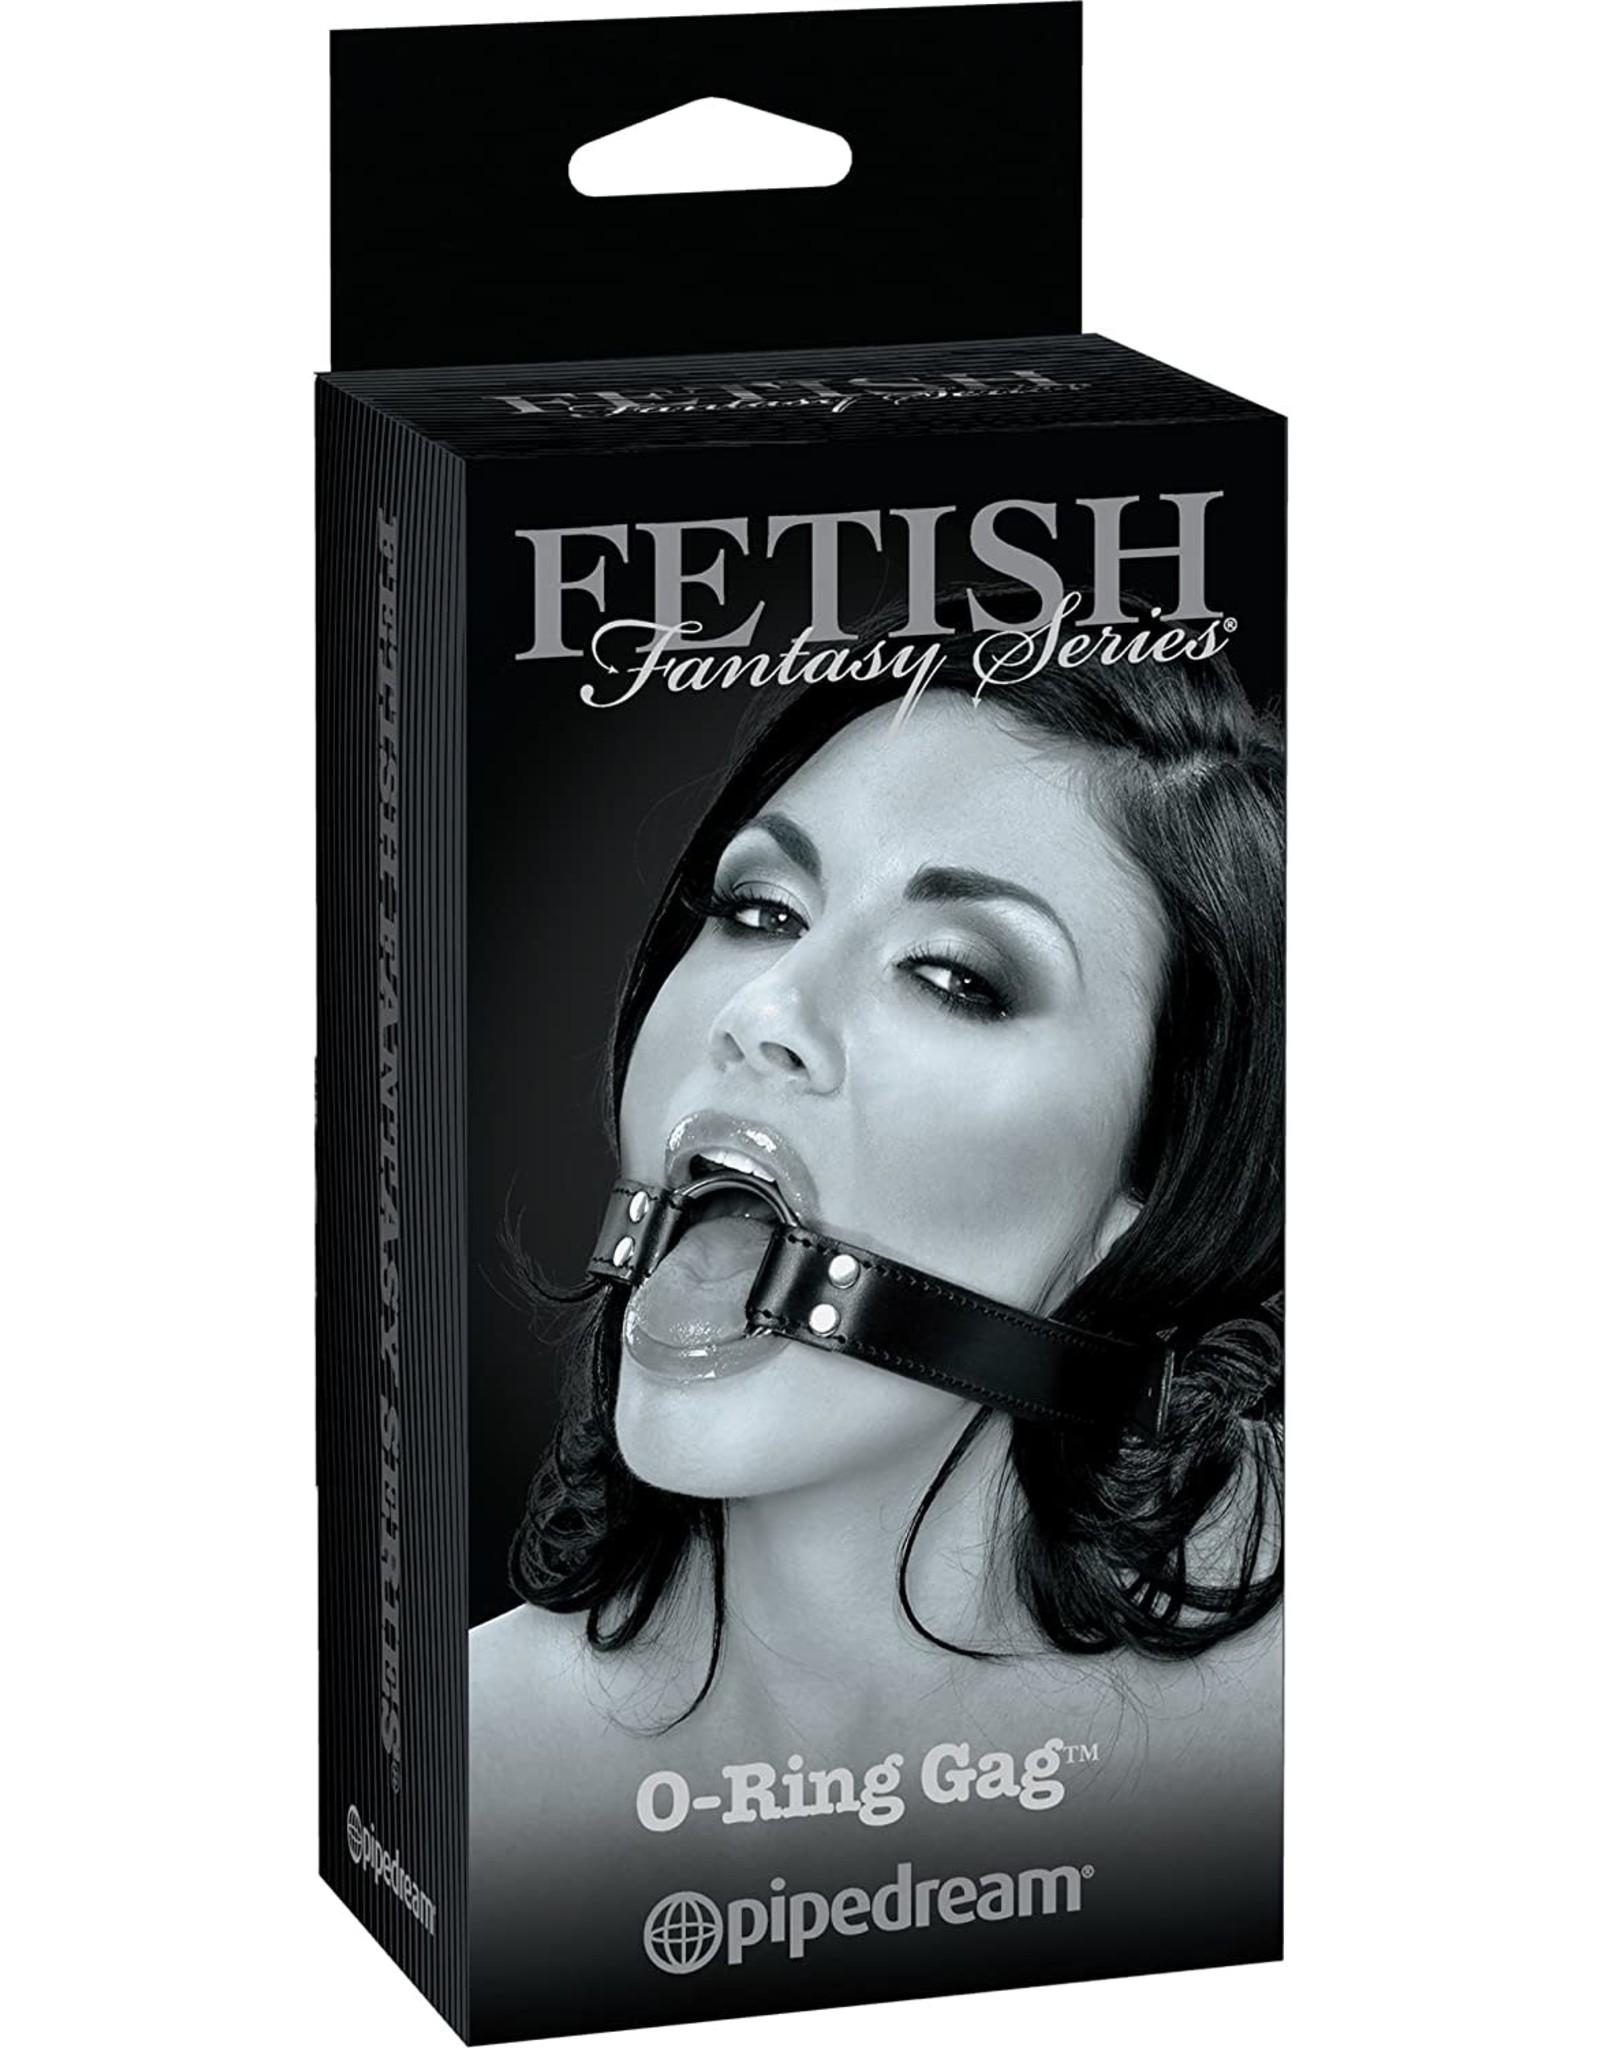 FETISH FANTASY FETISH FANTASY - O-RING GAG